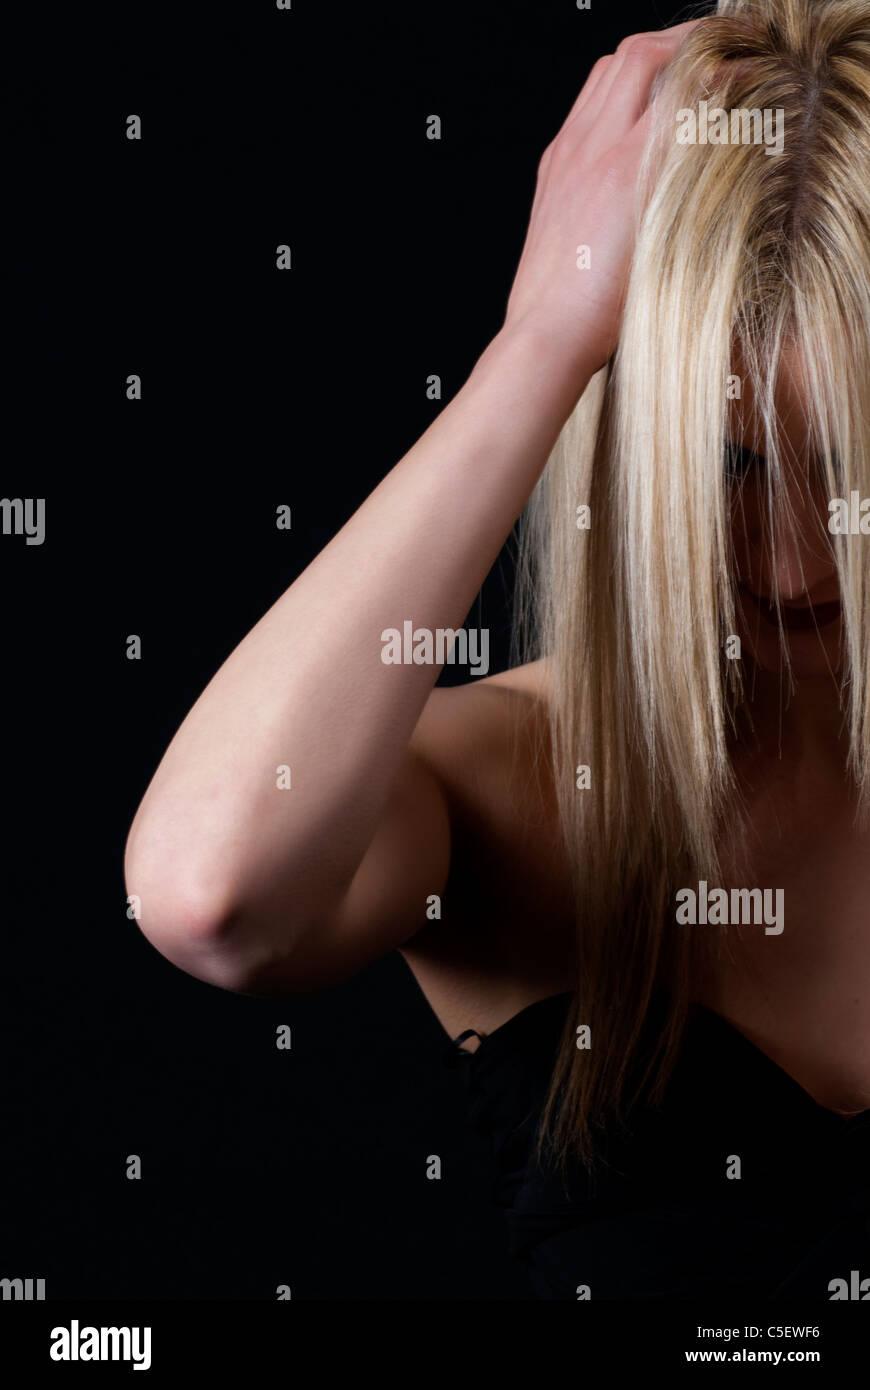 Depressed woman head in hands - Stock Image